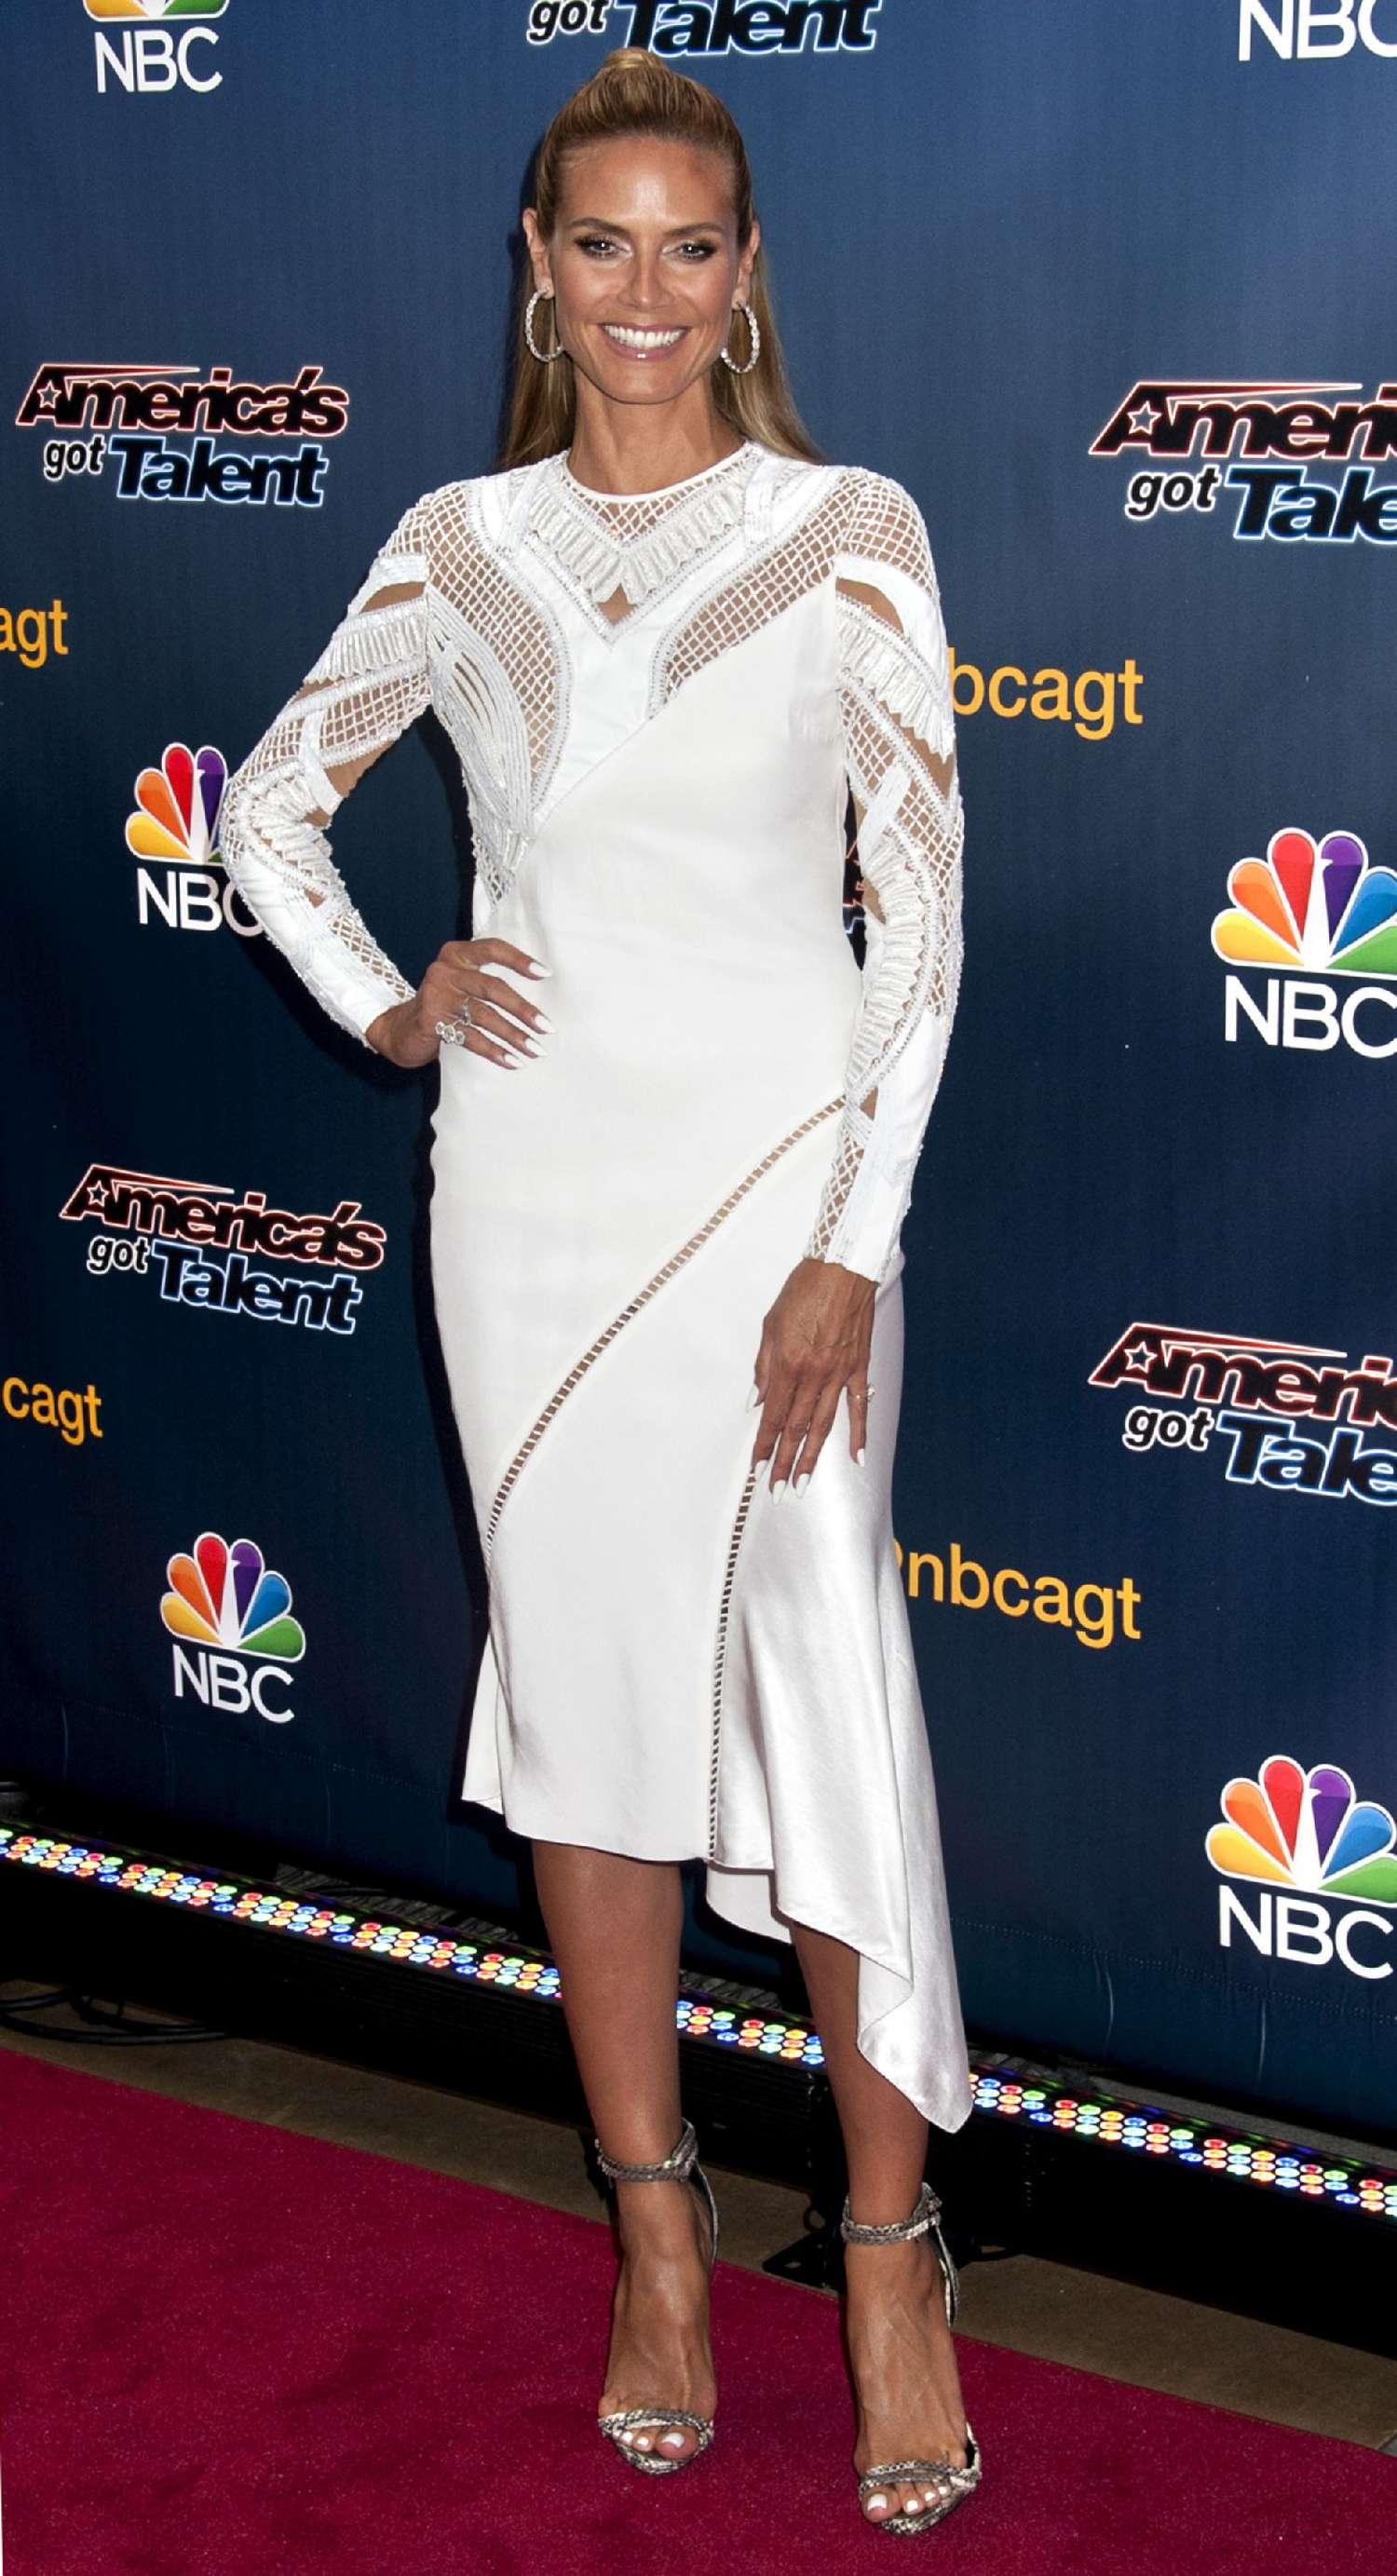 Heidi Klum 2014 : Heidi Klum: Americas Got Talent Season 9 Event -05